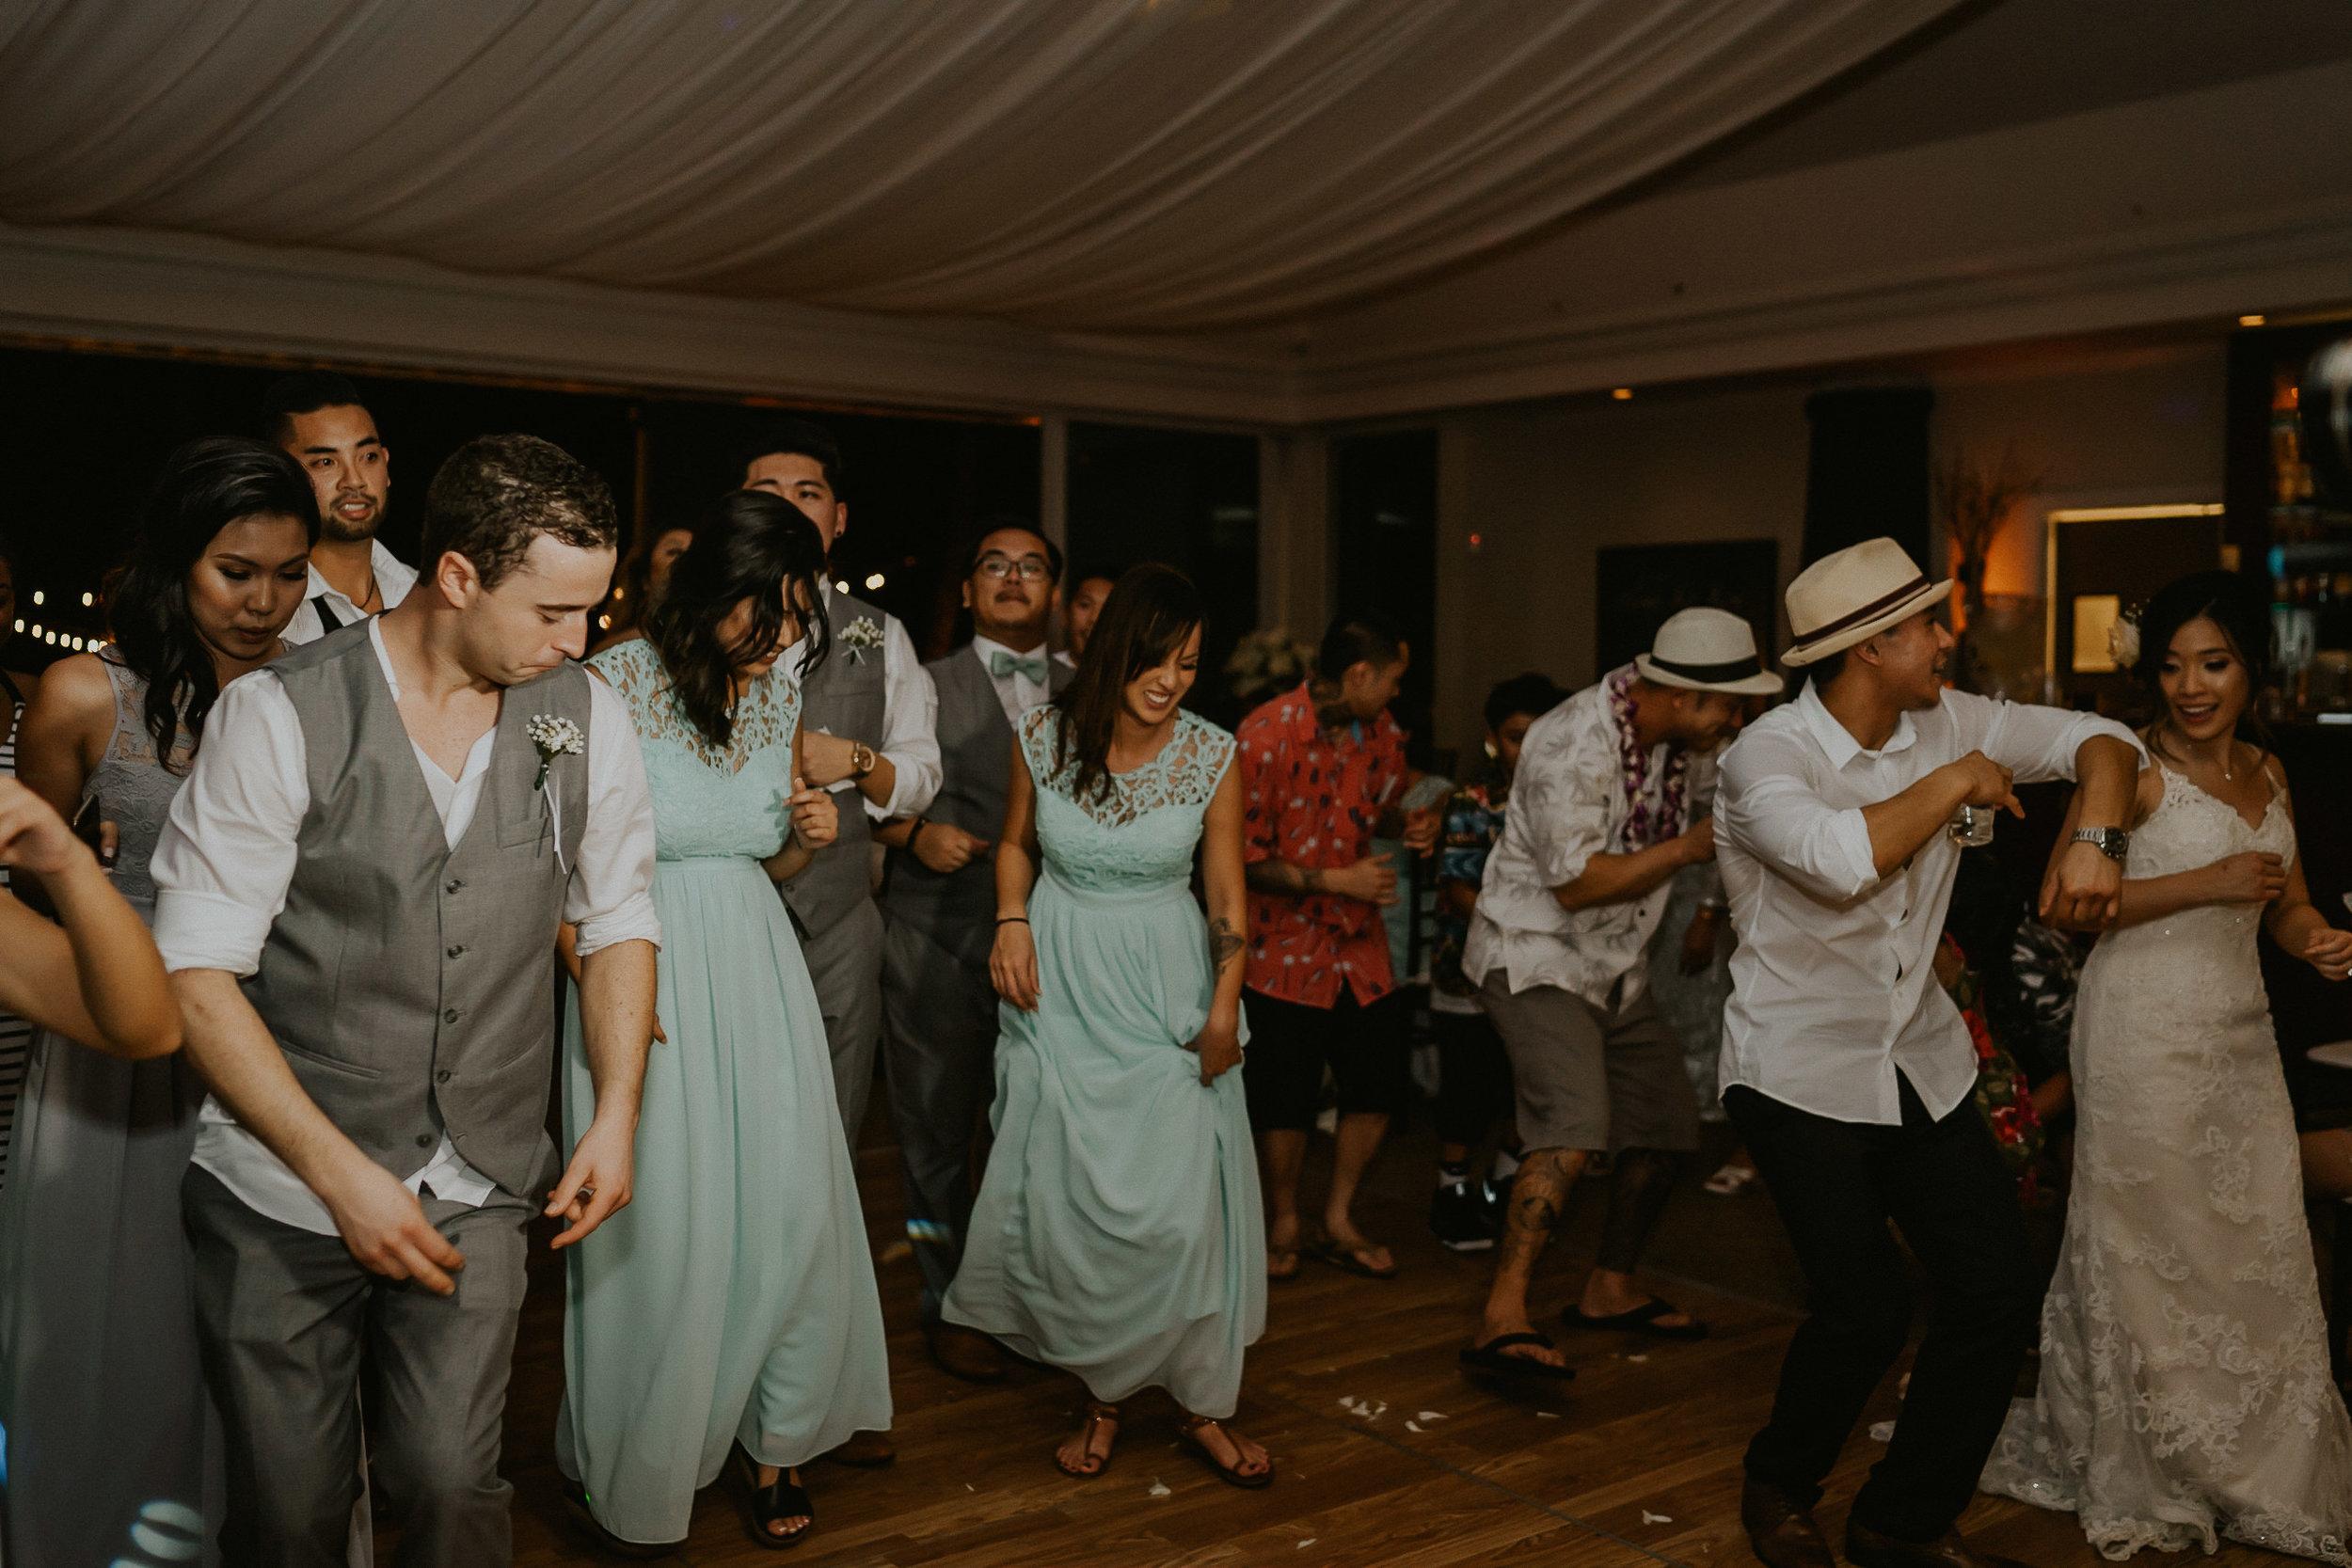 Maui_Destination_wedding_Alfred_Tang-108.jpg